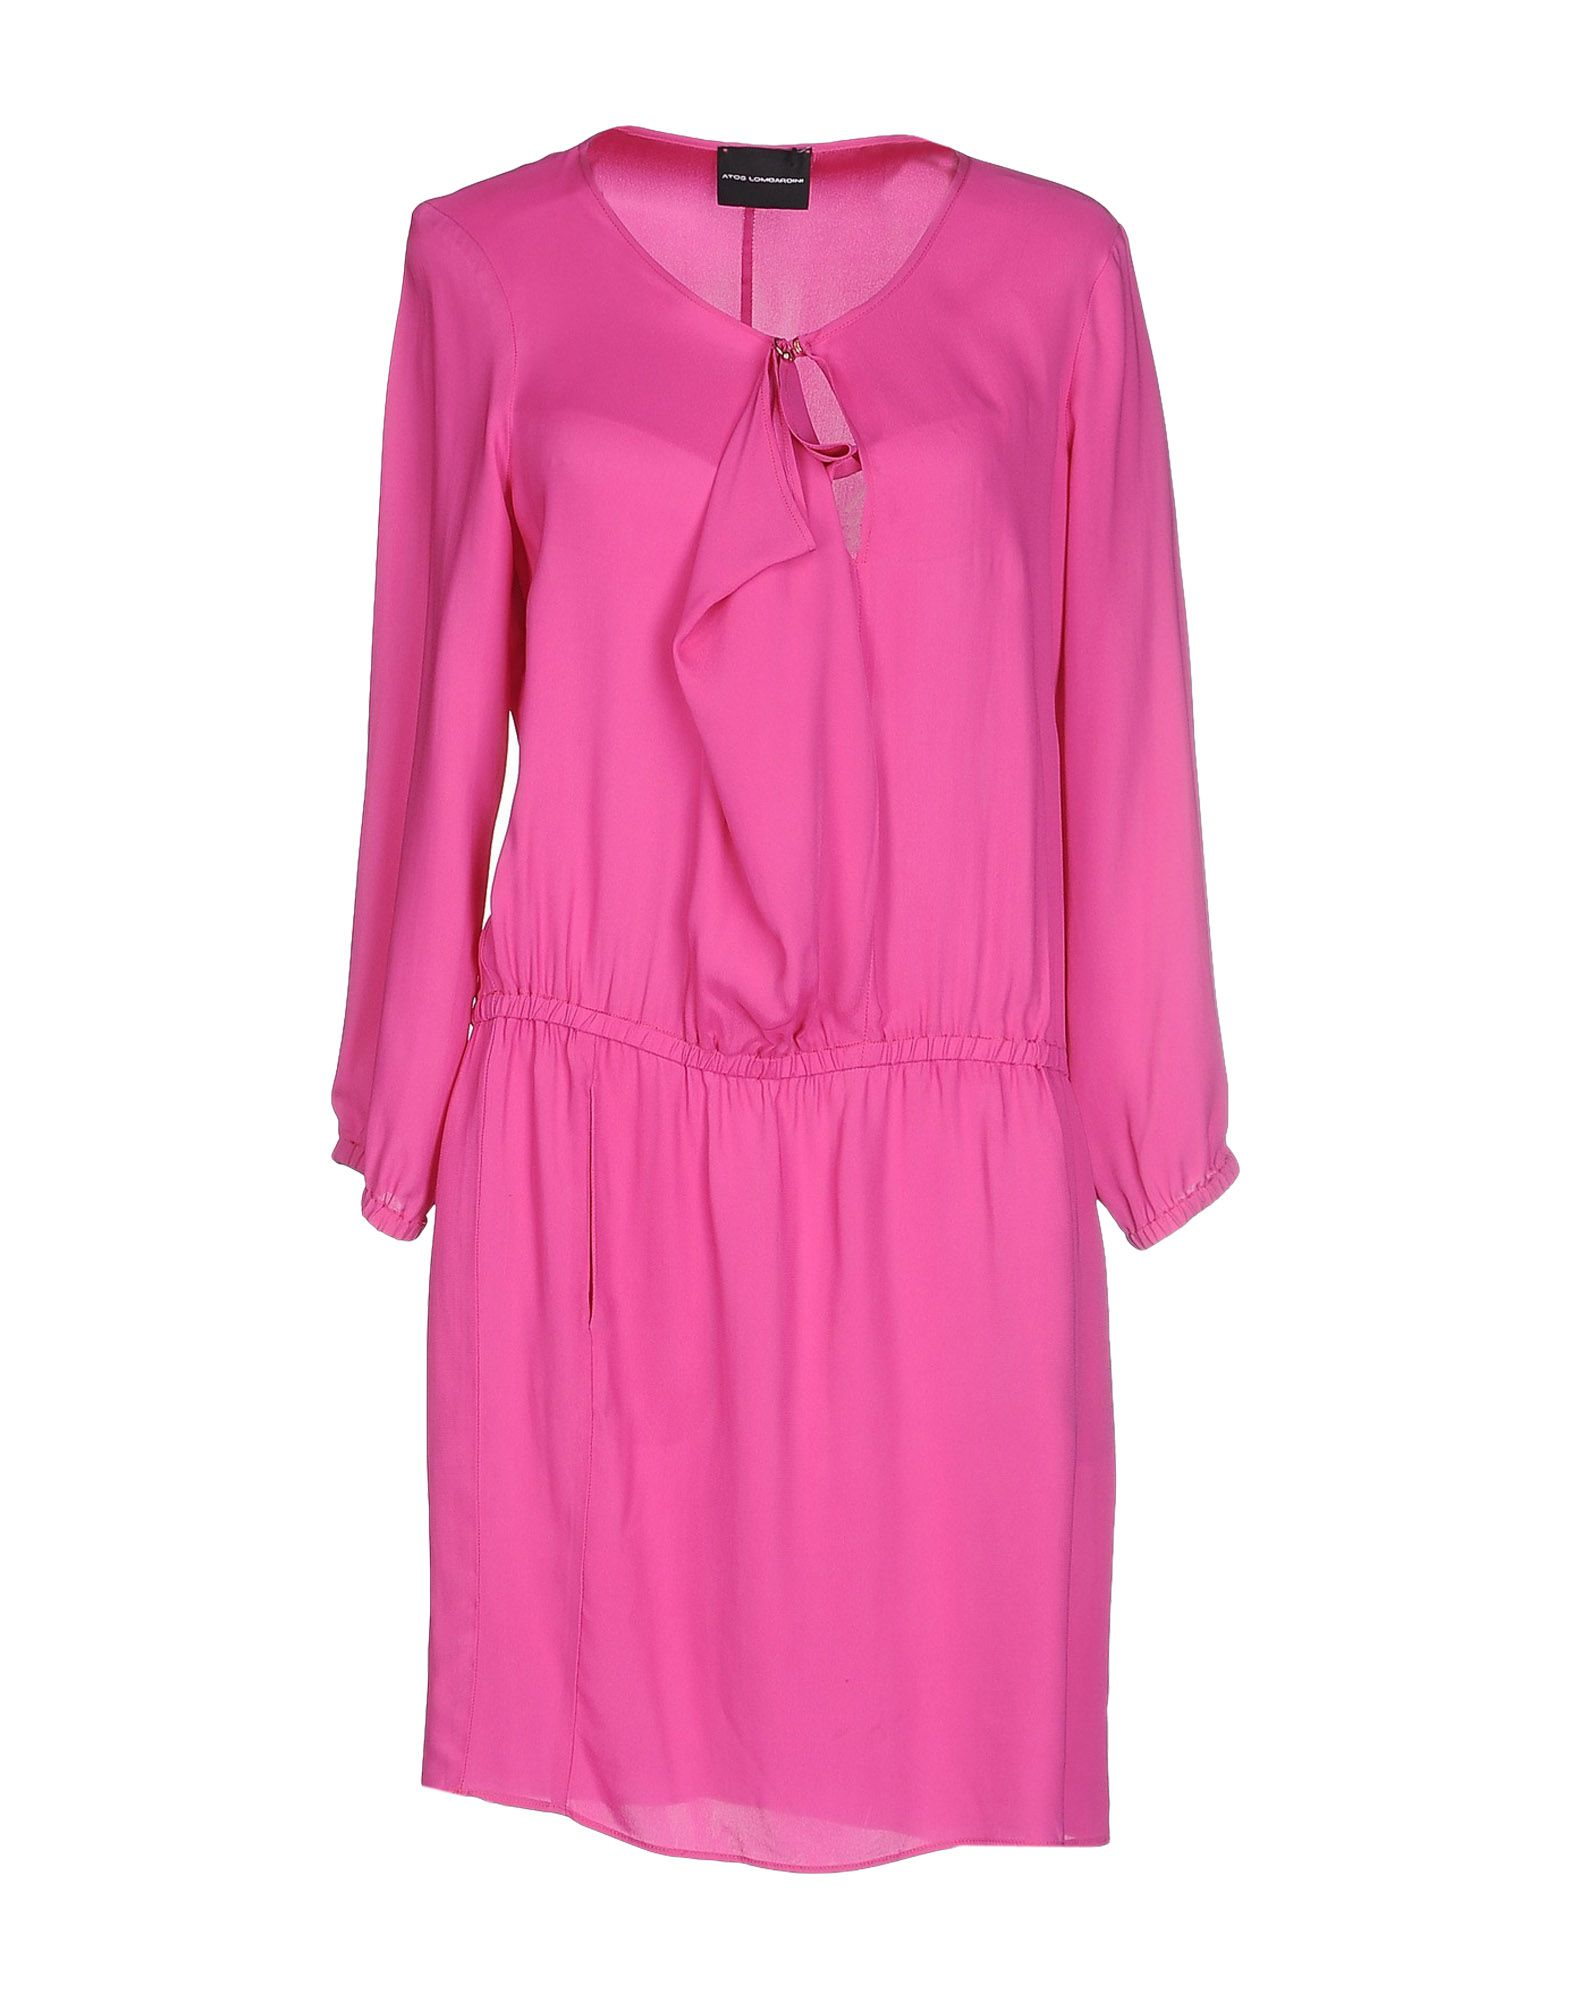 ATOS LOMBARDINI Damen Kurzes Kleid Farbe Fuchsia Größe 3